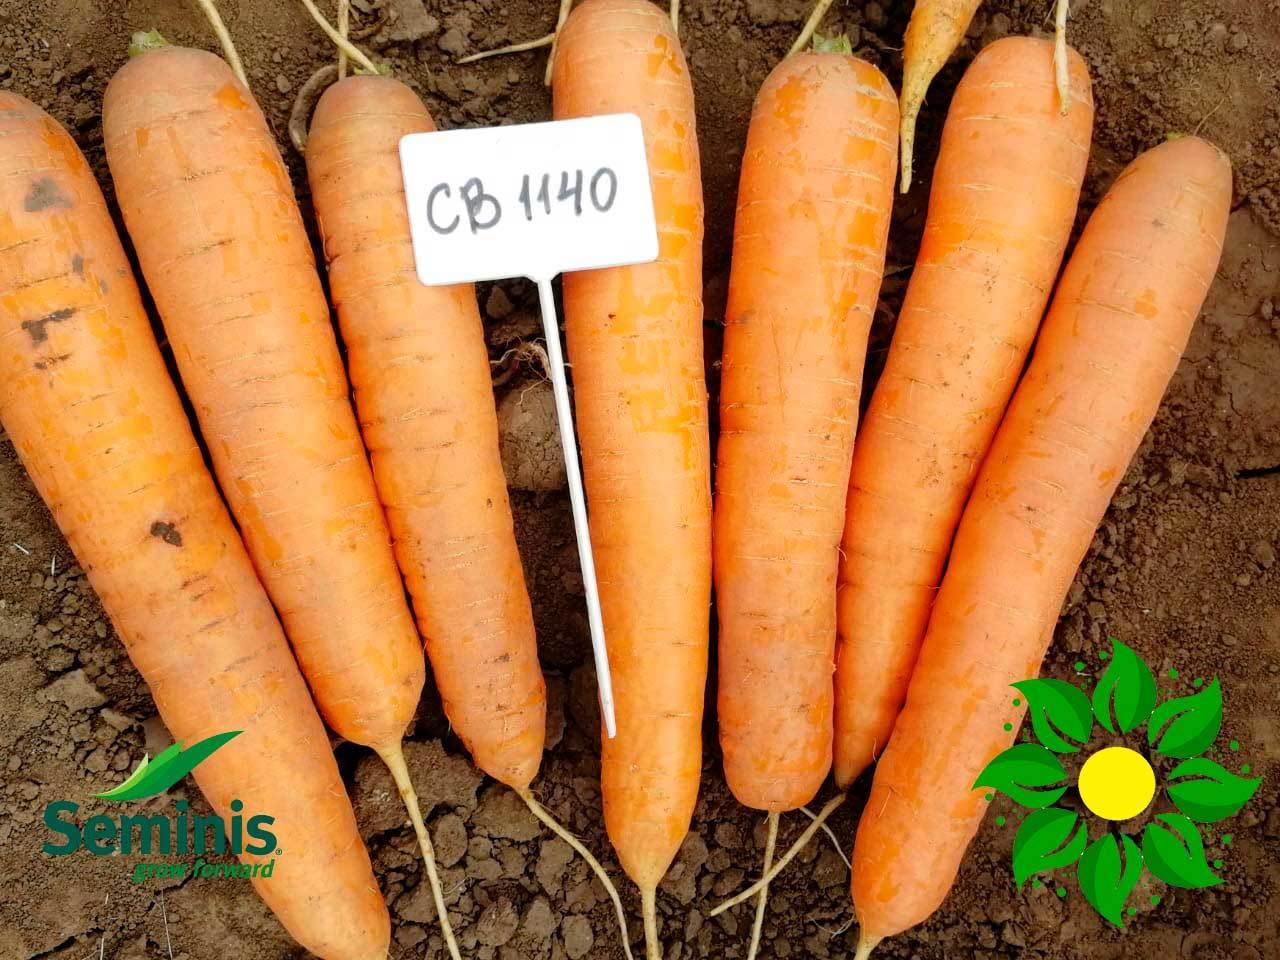 Новинка от бренда Seminis - отличная морковь СВ 1140.